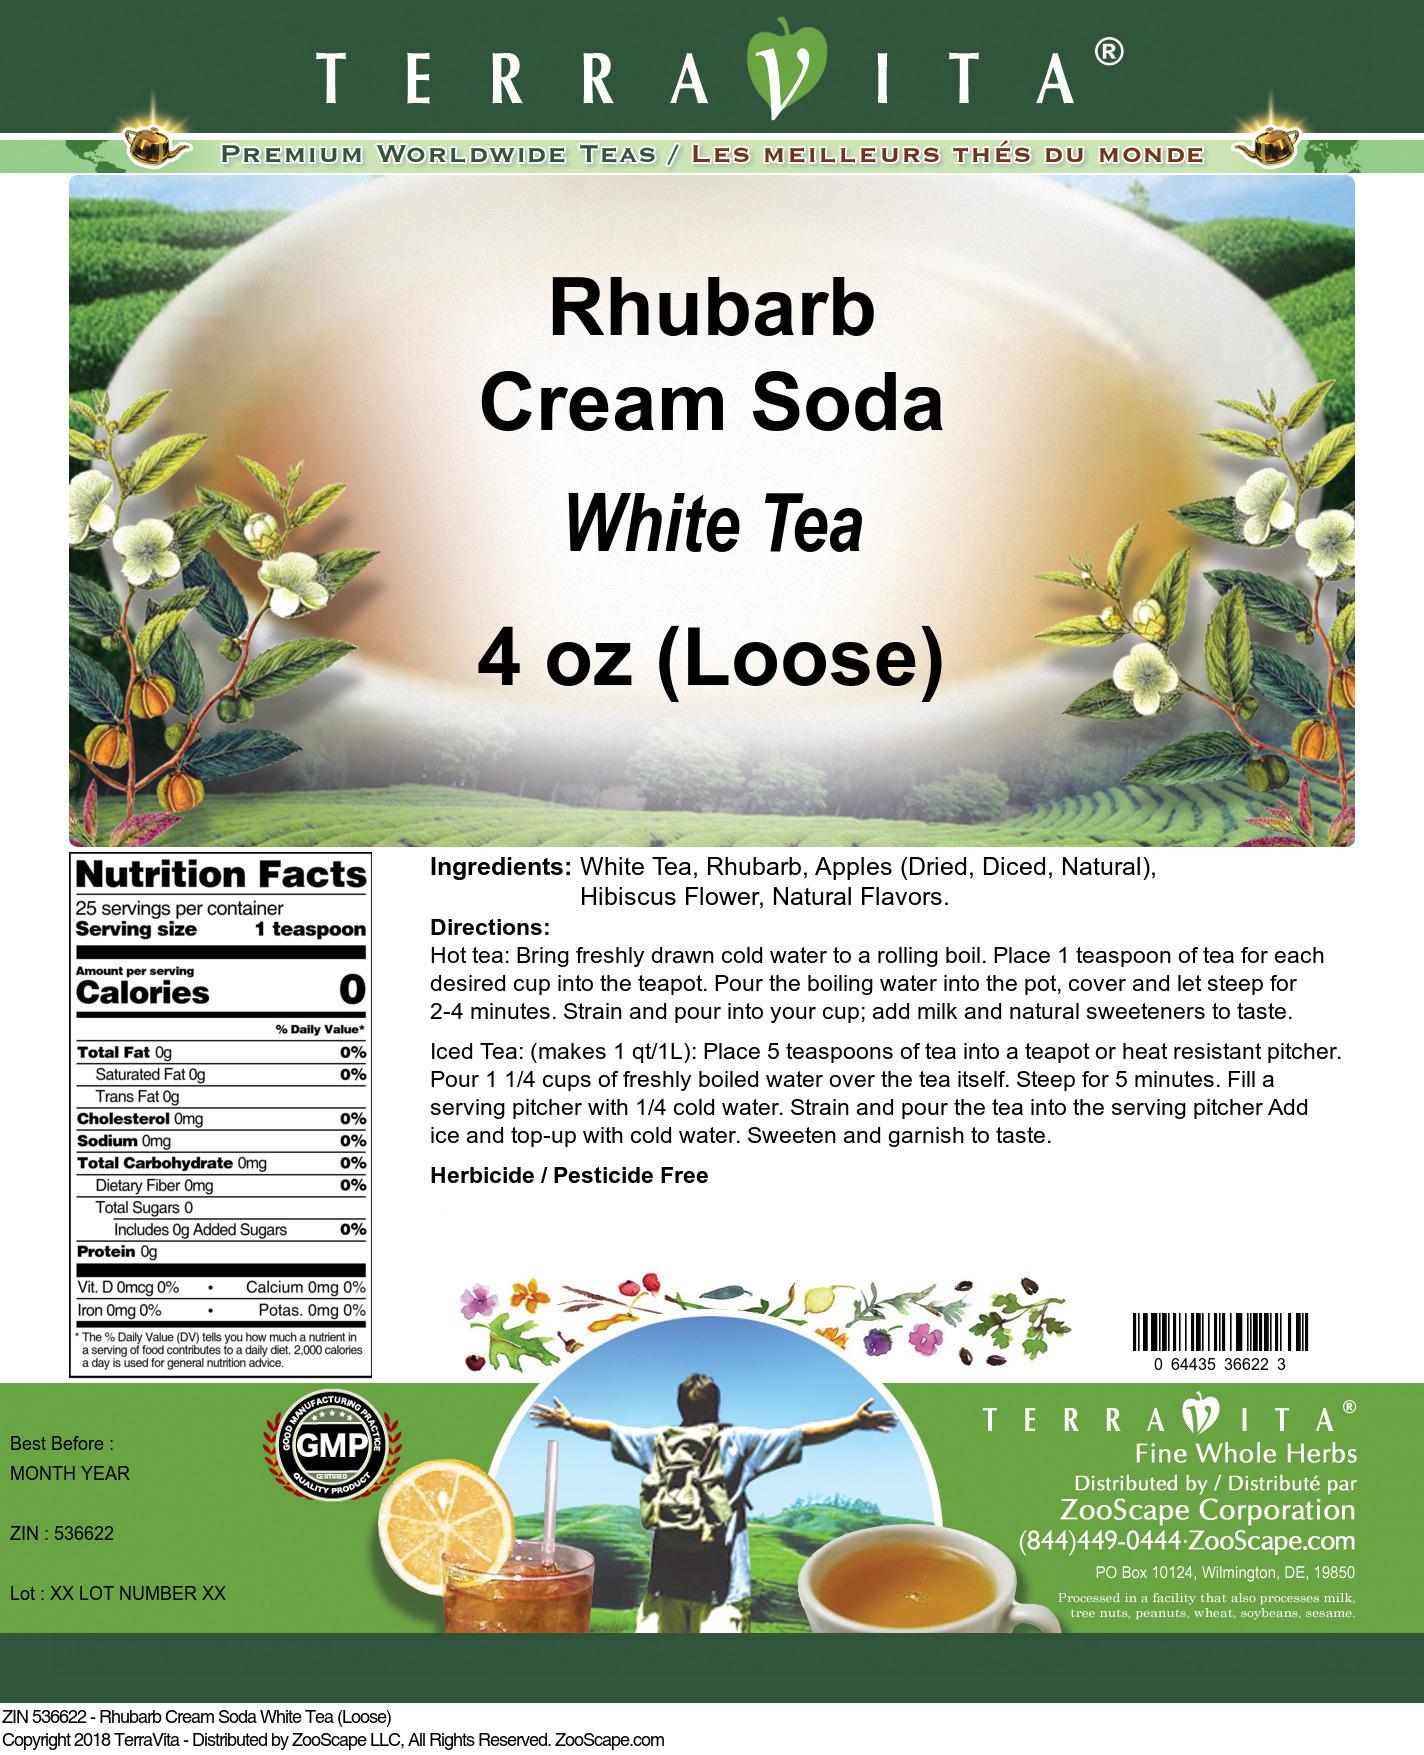 Rhubarb Cream Soda White Tea (Loose)